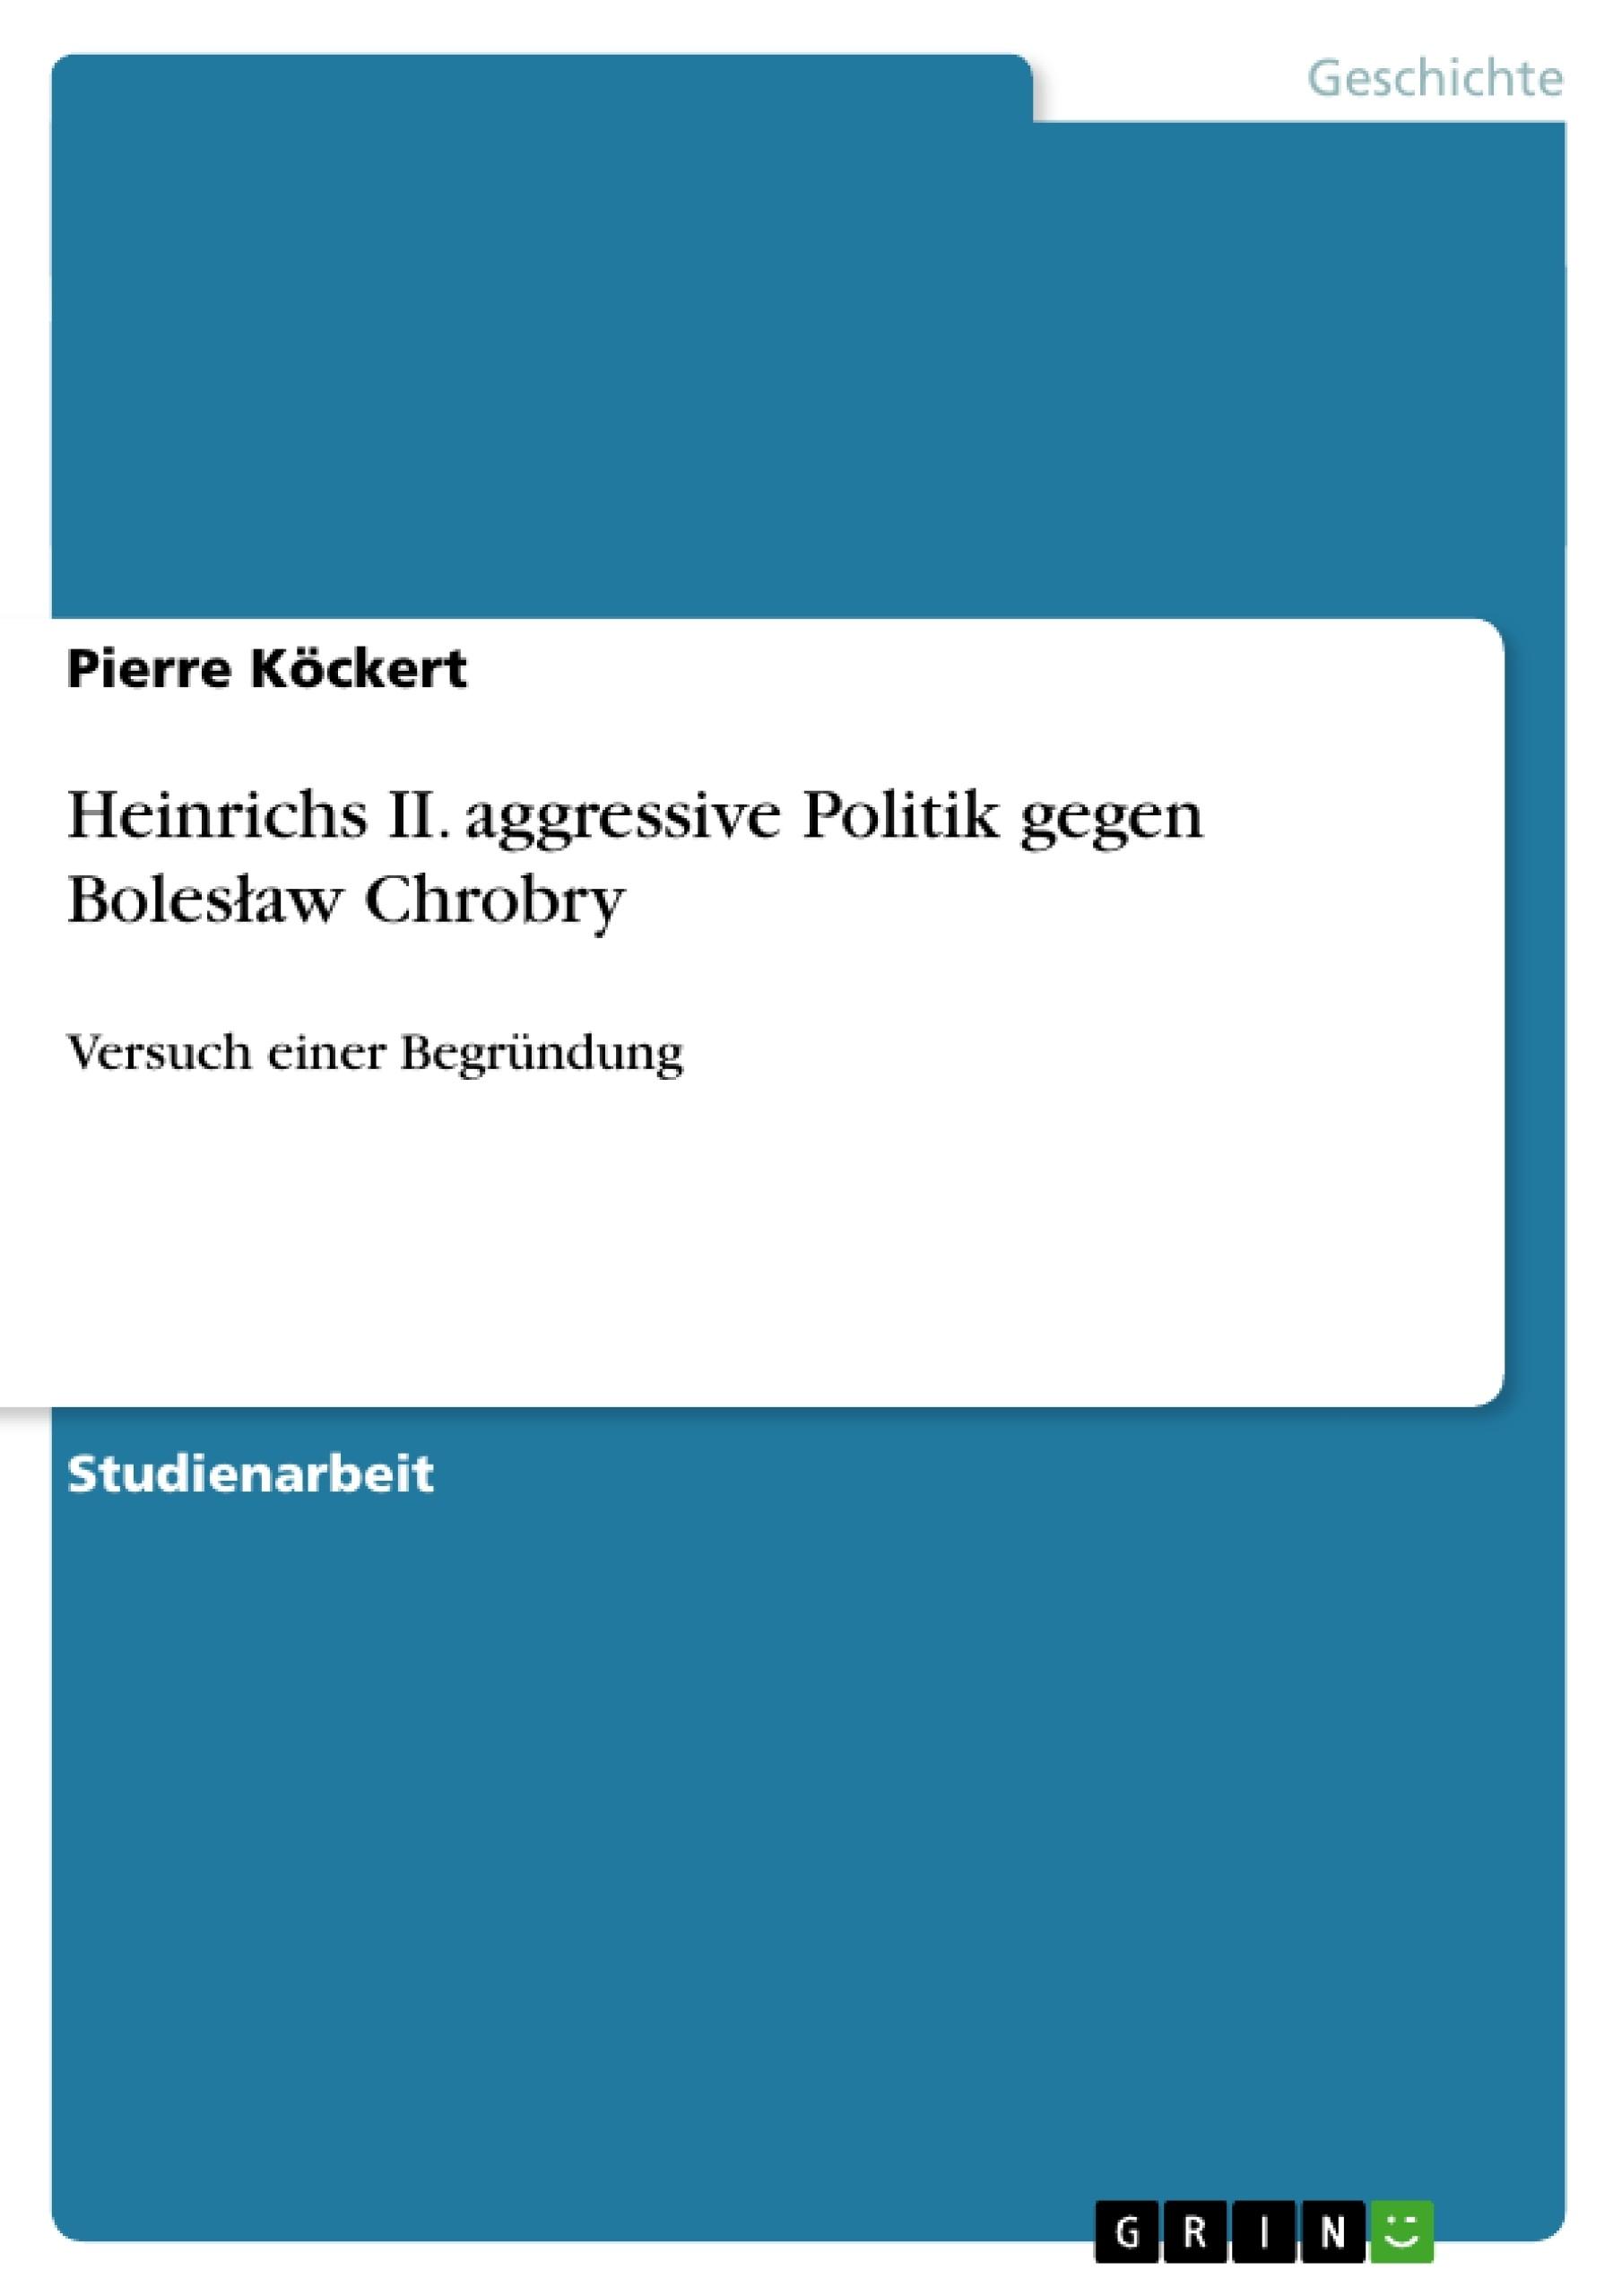 Titel: Heinrichs II. aggressive Politik gegen Bolesław Chrobry